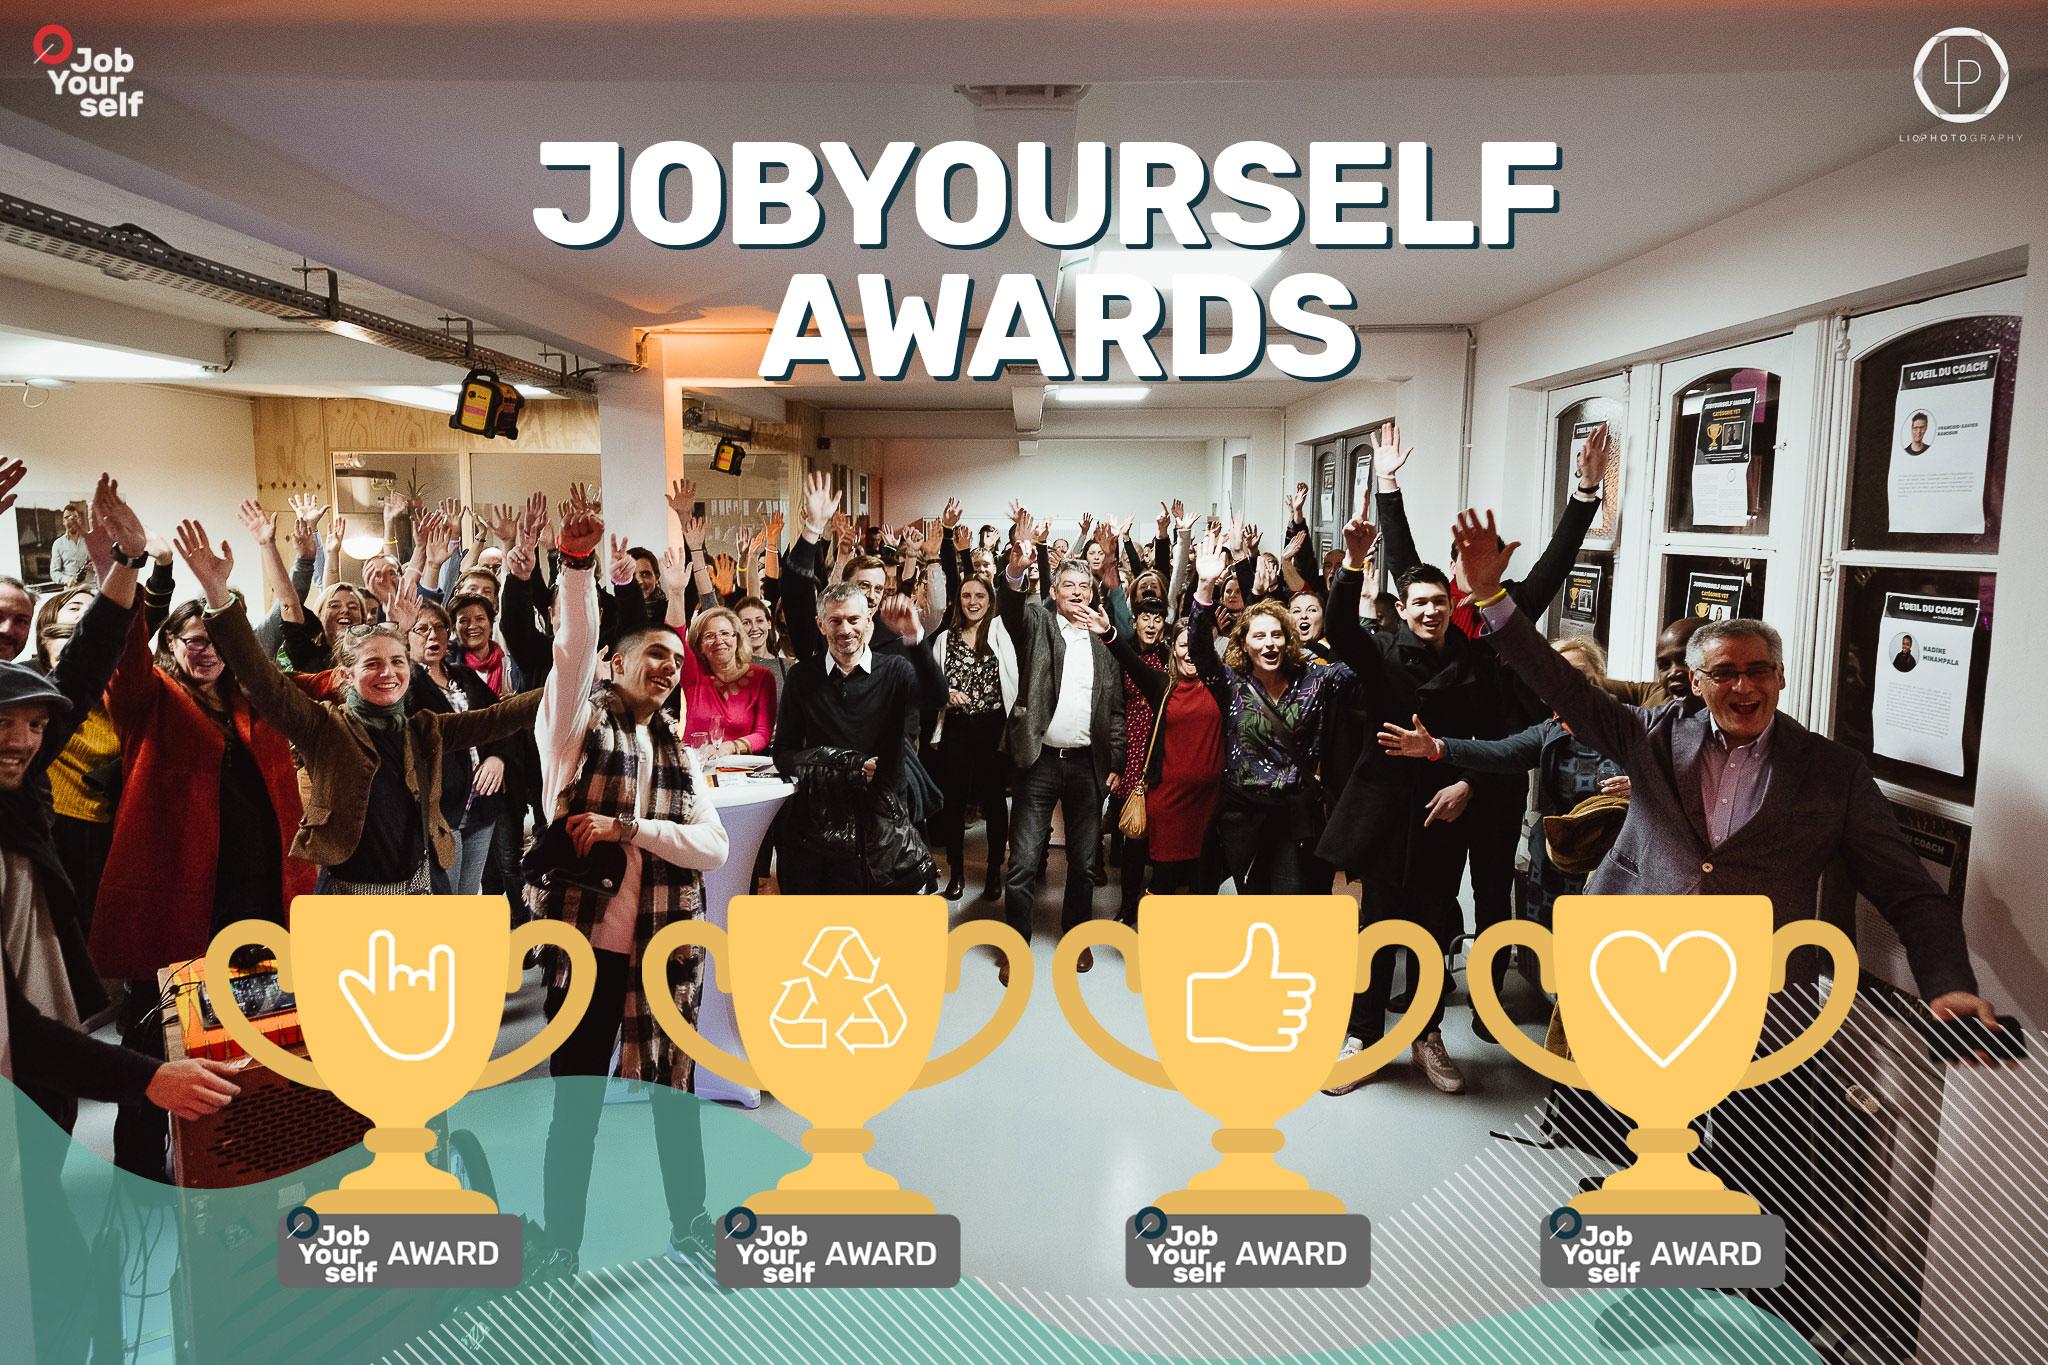 JOBYOURSELF AWARDS